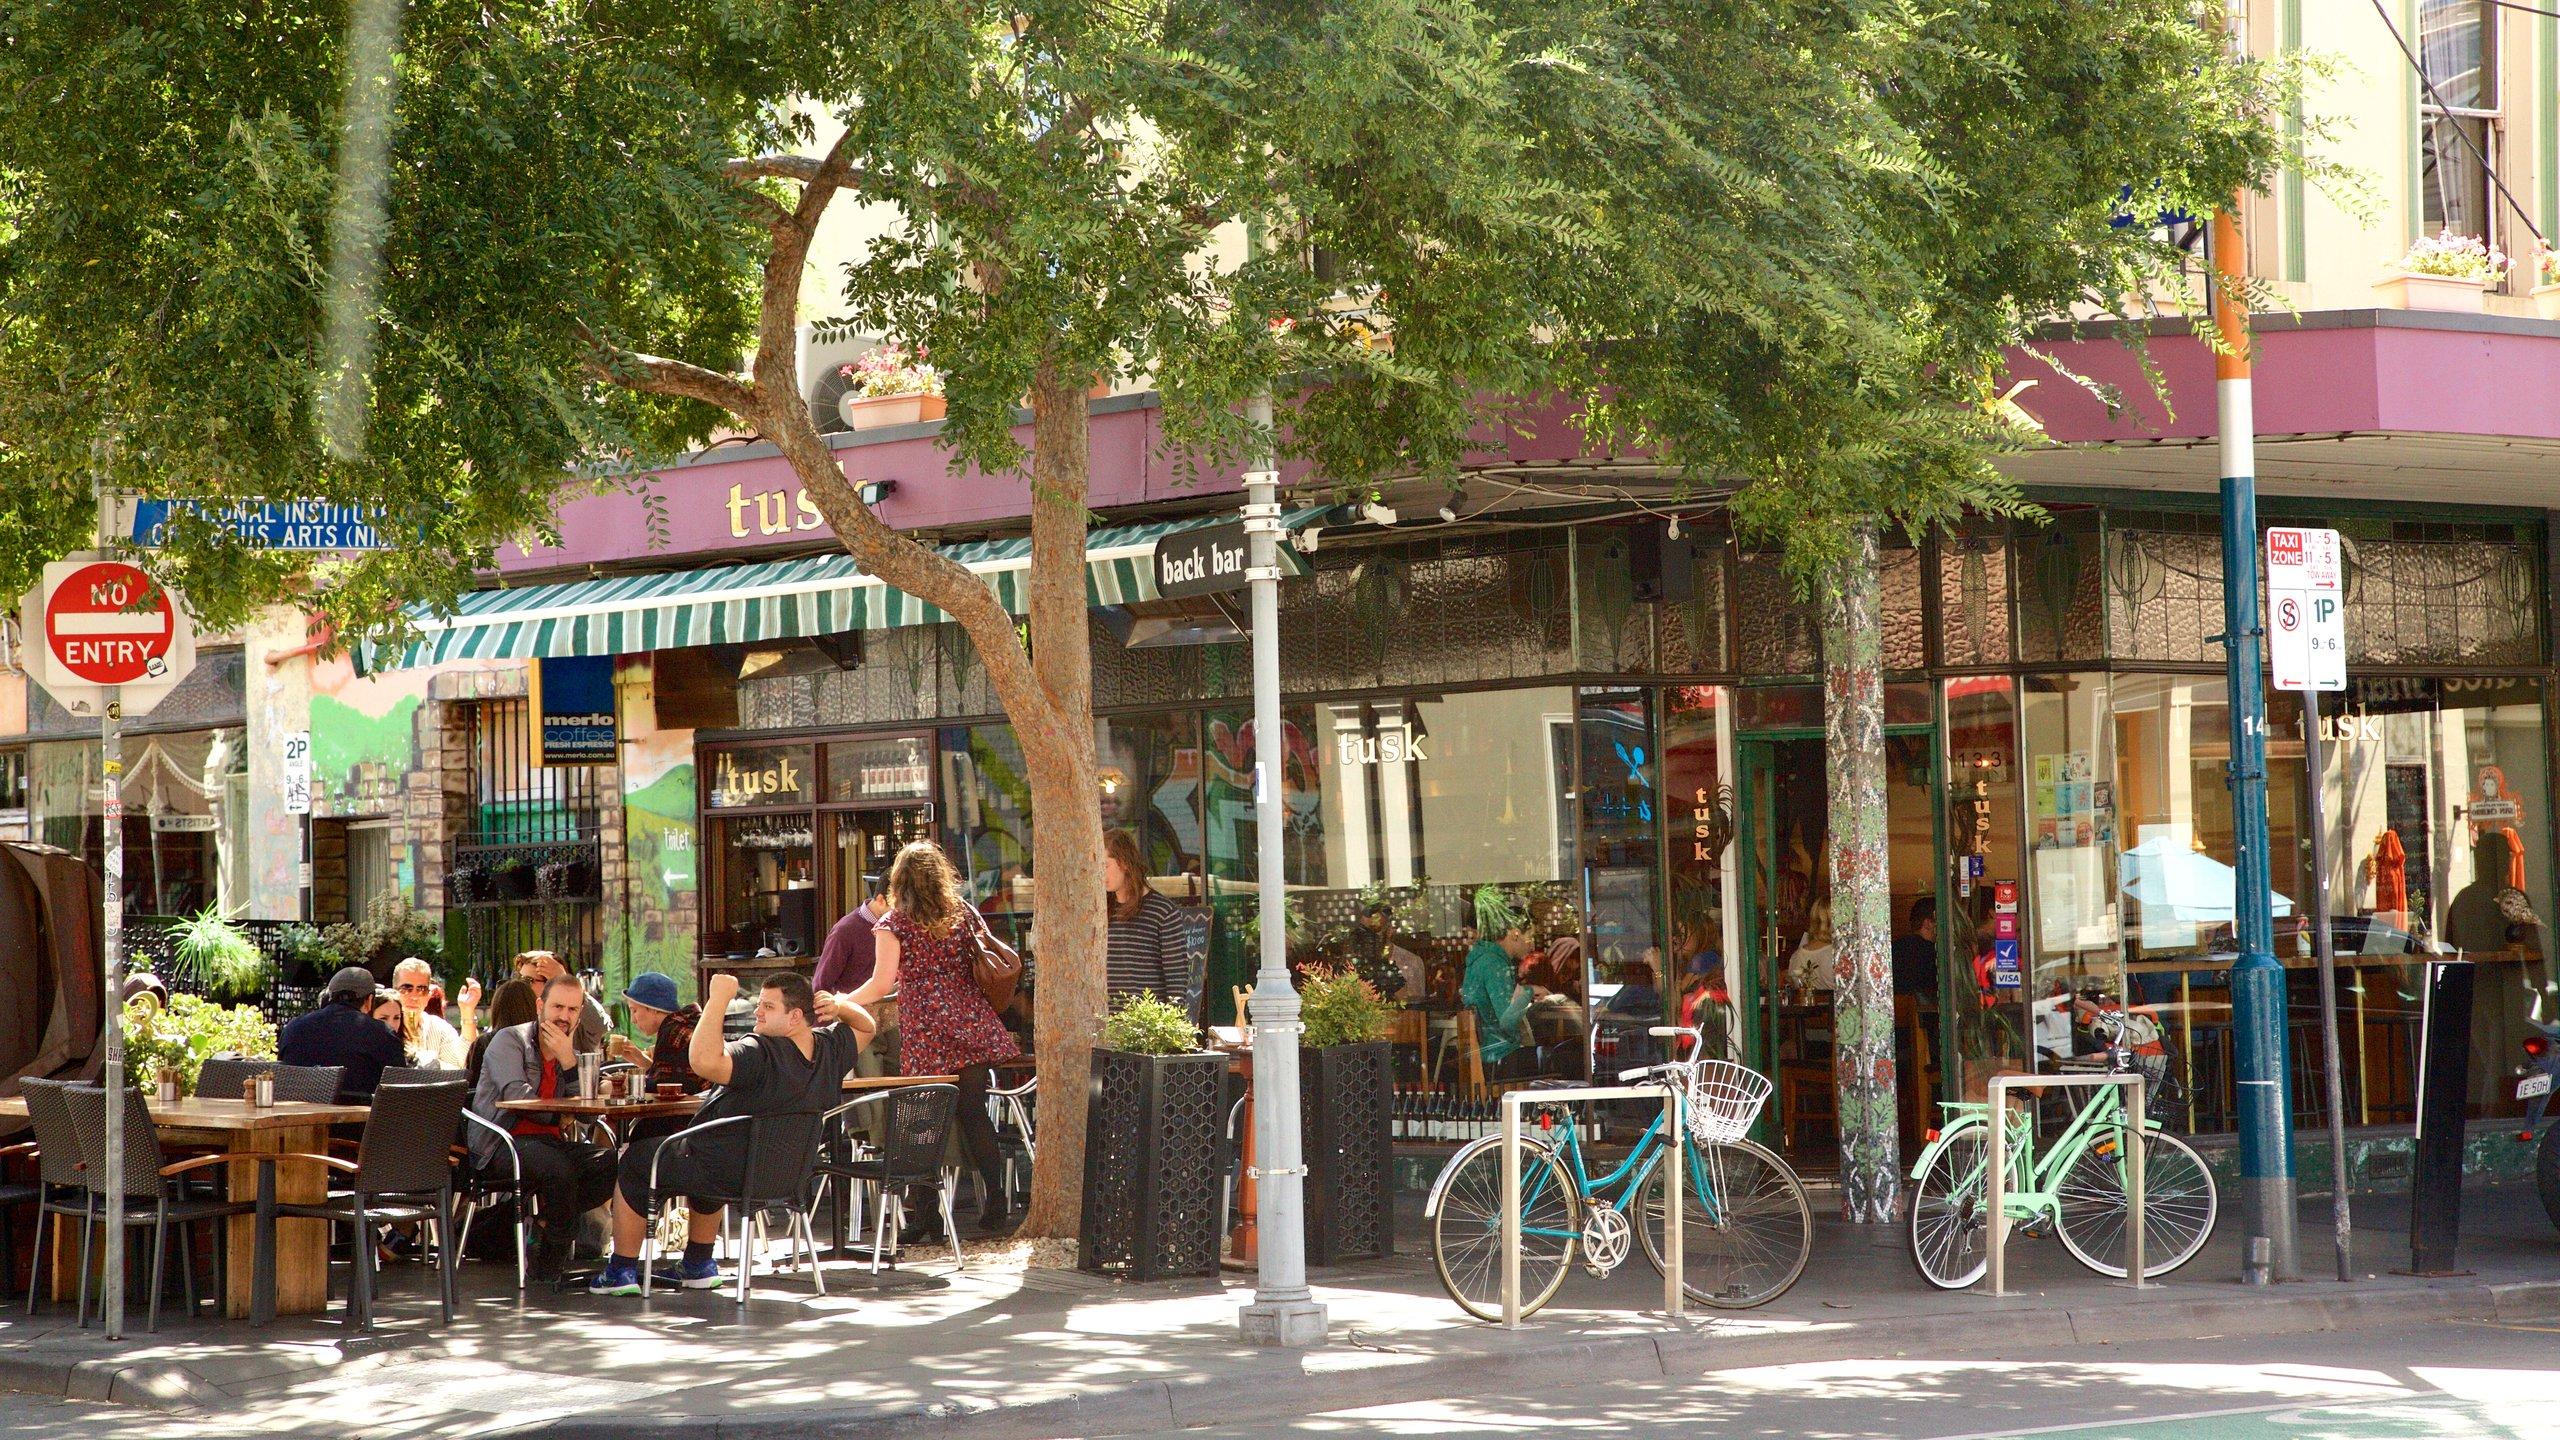 Image result for Tusk cafe prahran